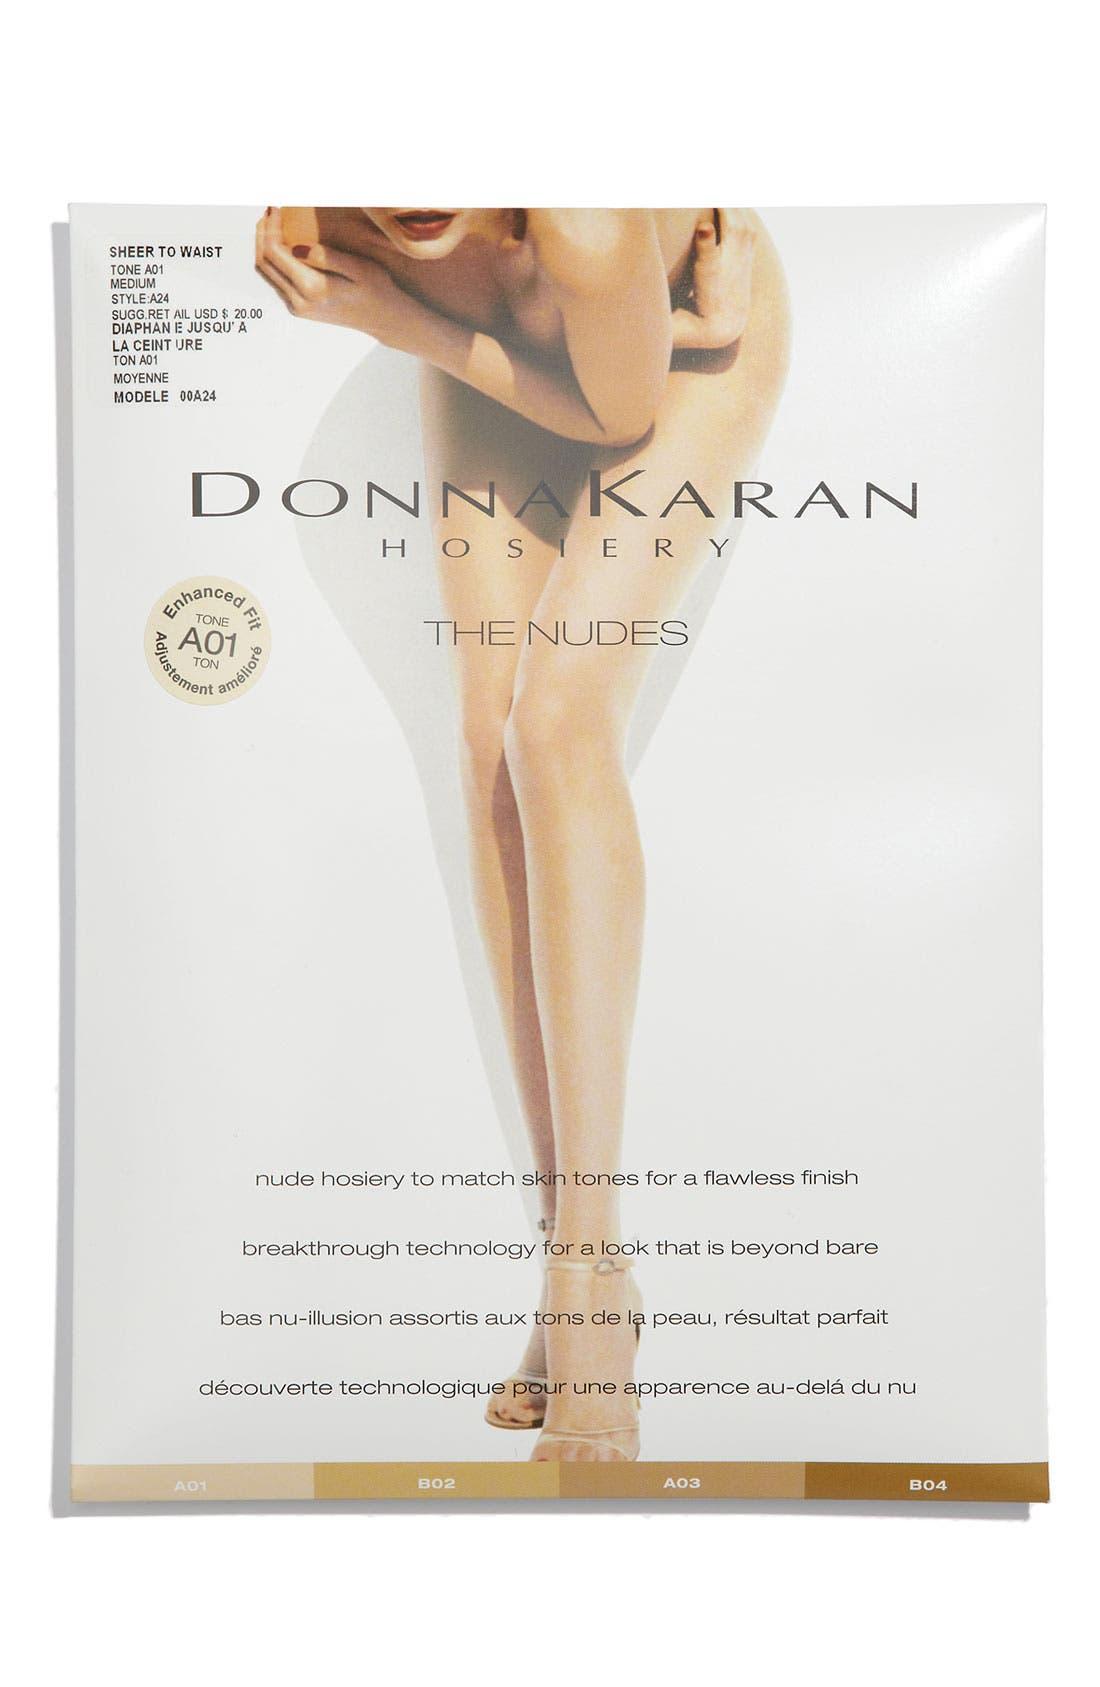 Alternate Image 2  - Donna Karan 'The Nudes' Sheer to Waist Hosiery